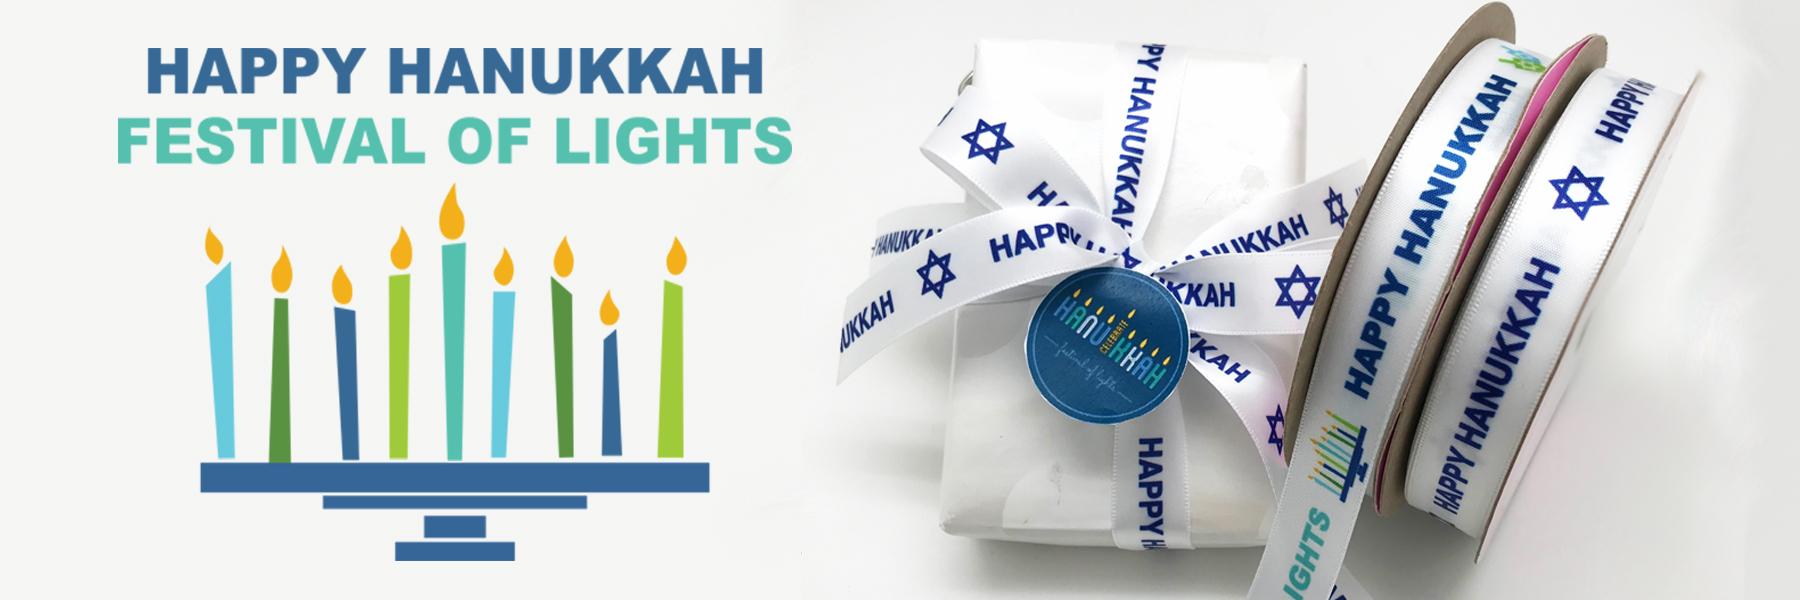 hanukkah-carousel-2017-product.jpg